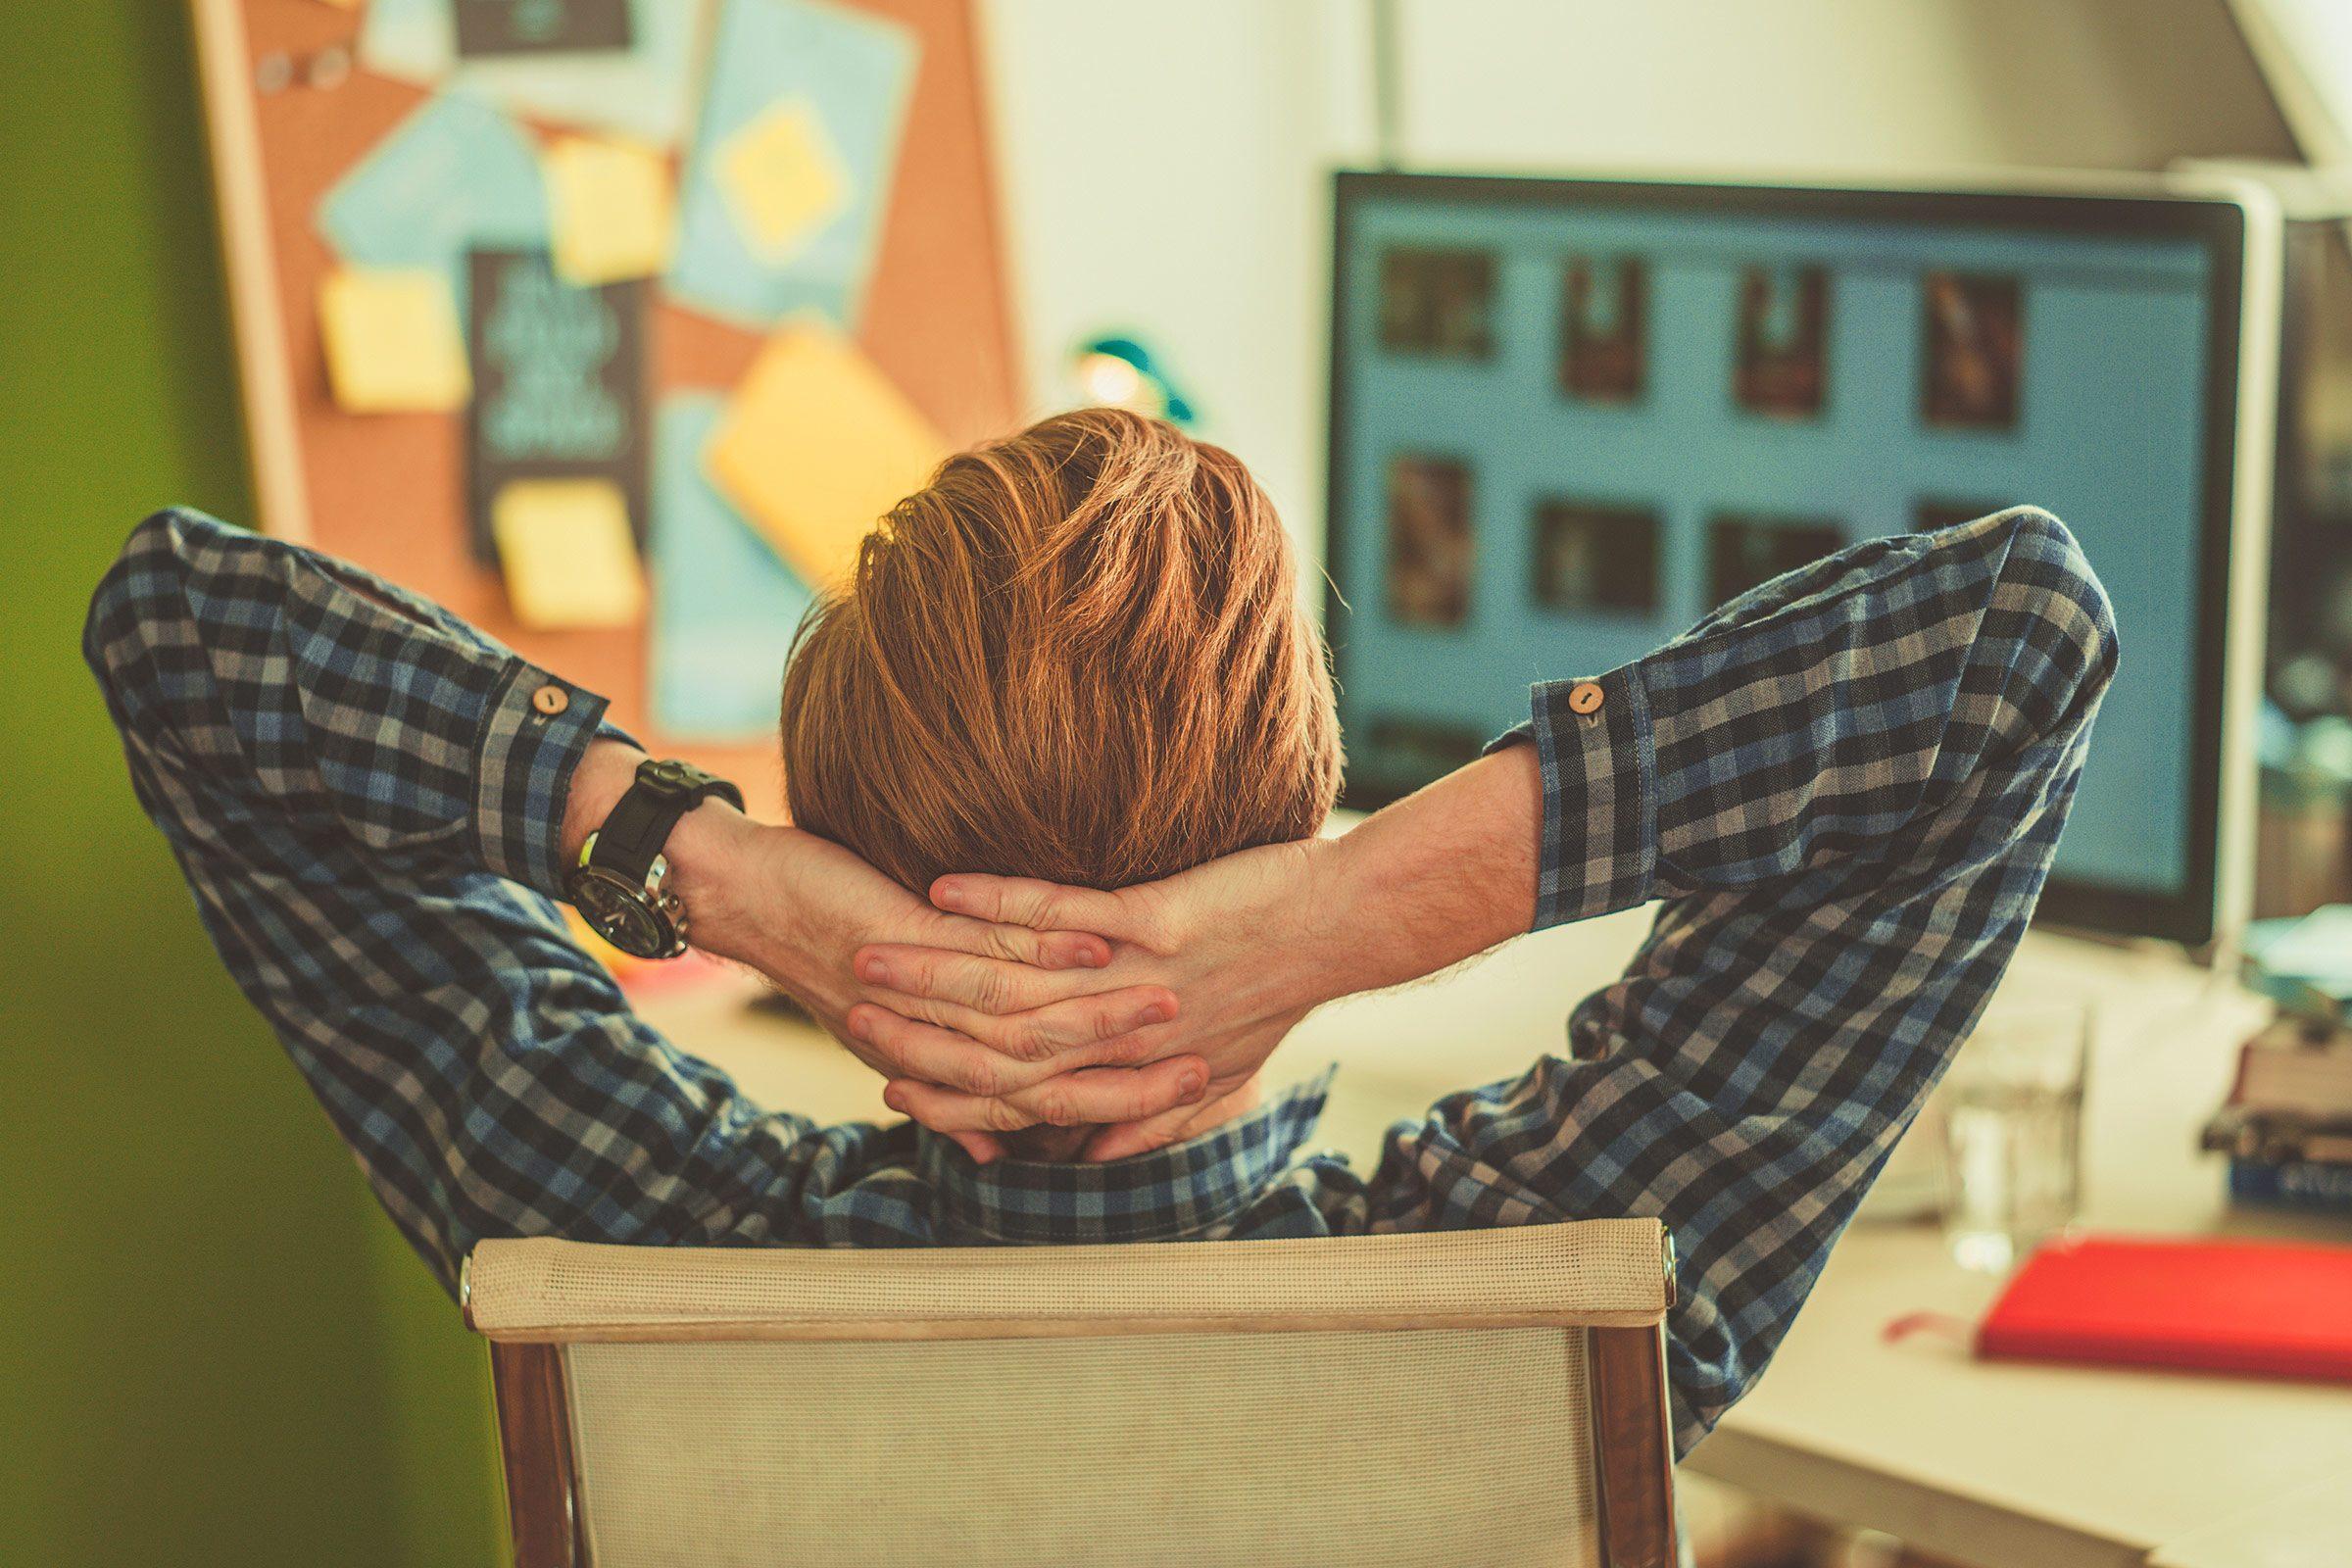 How can I de-stress myself?